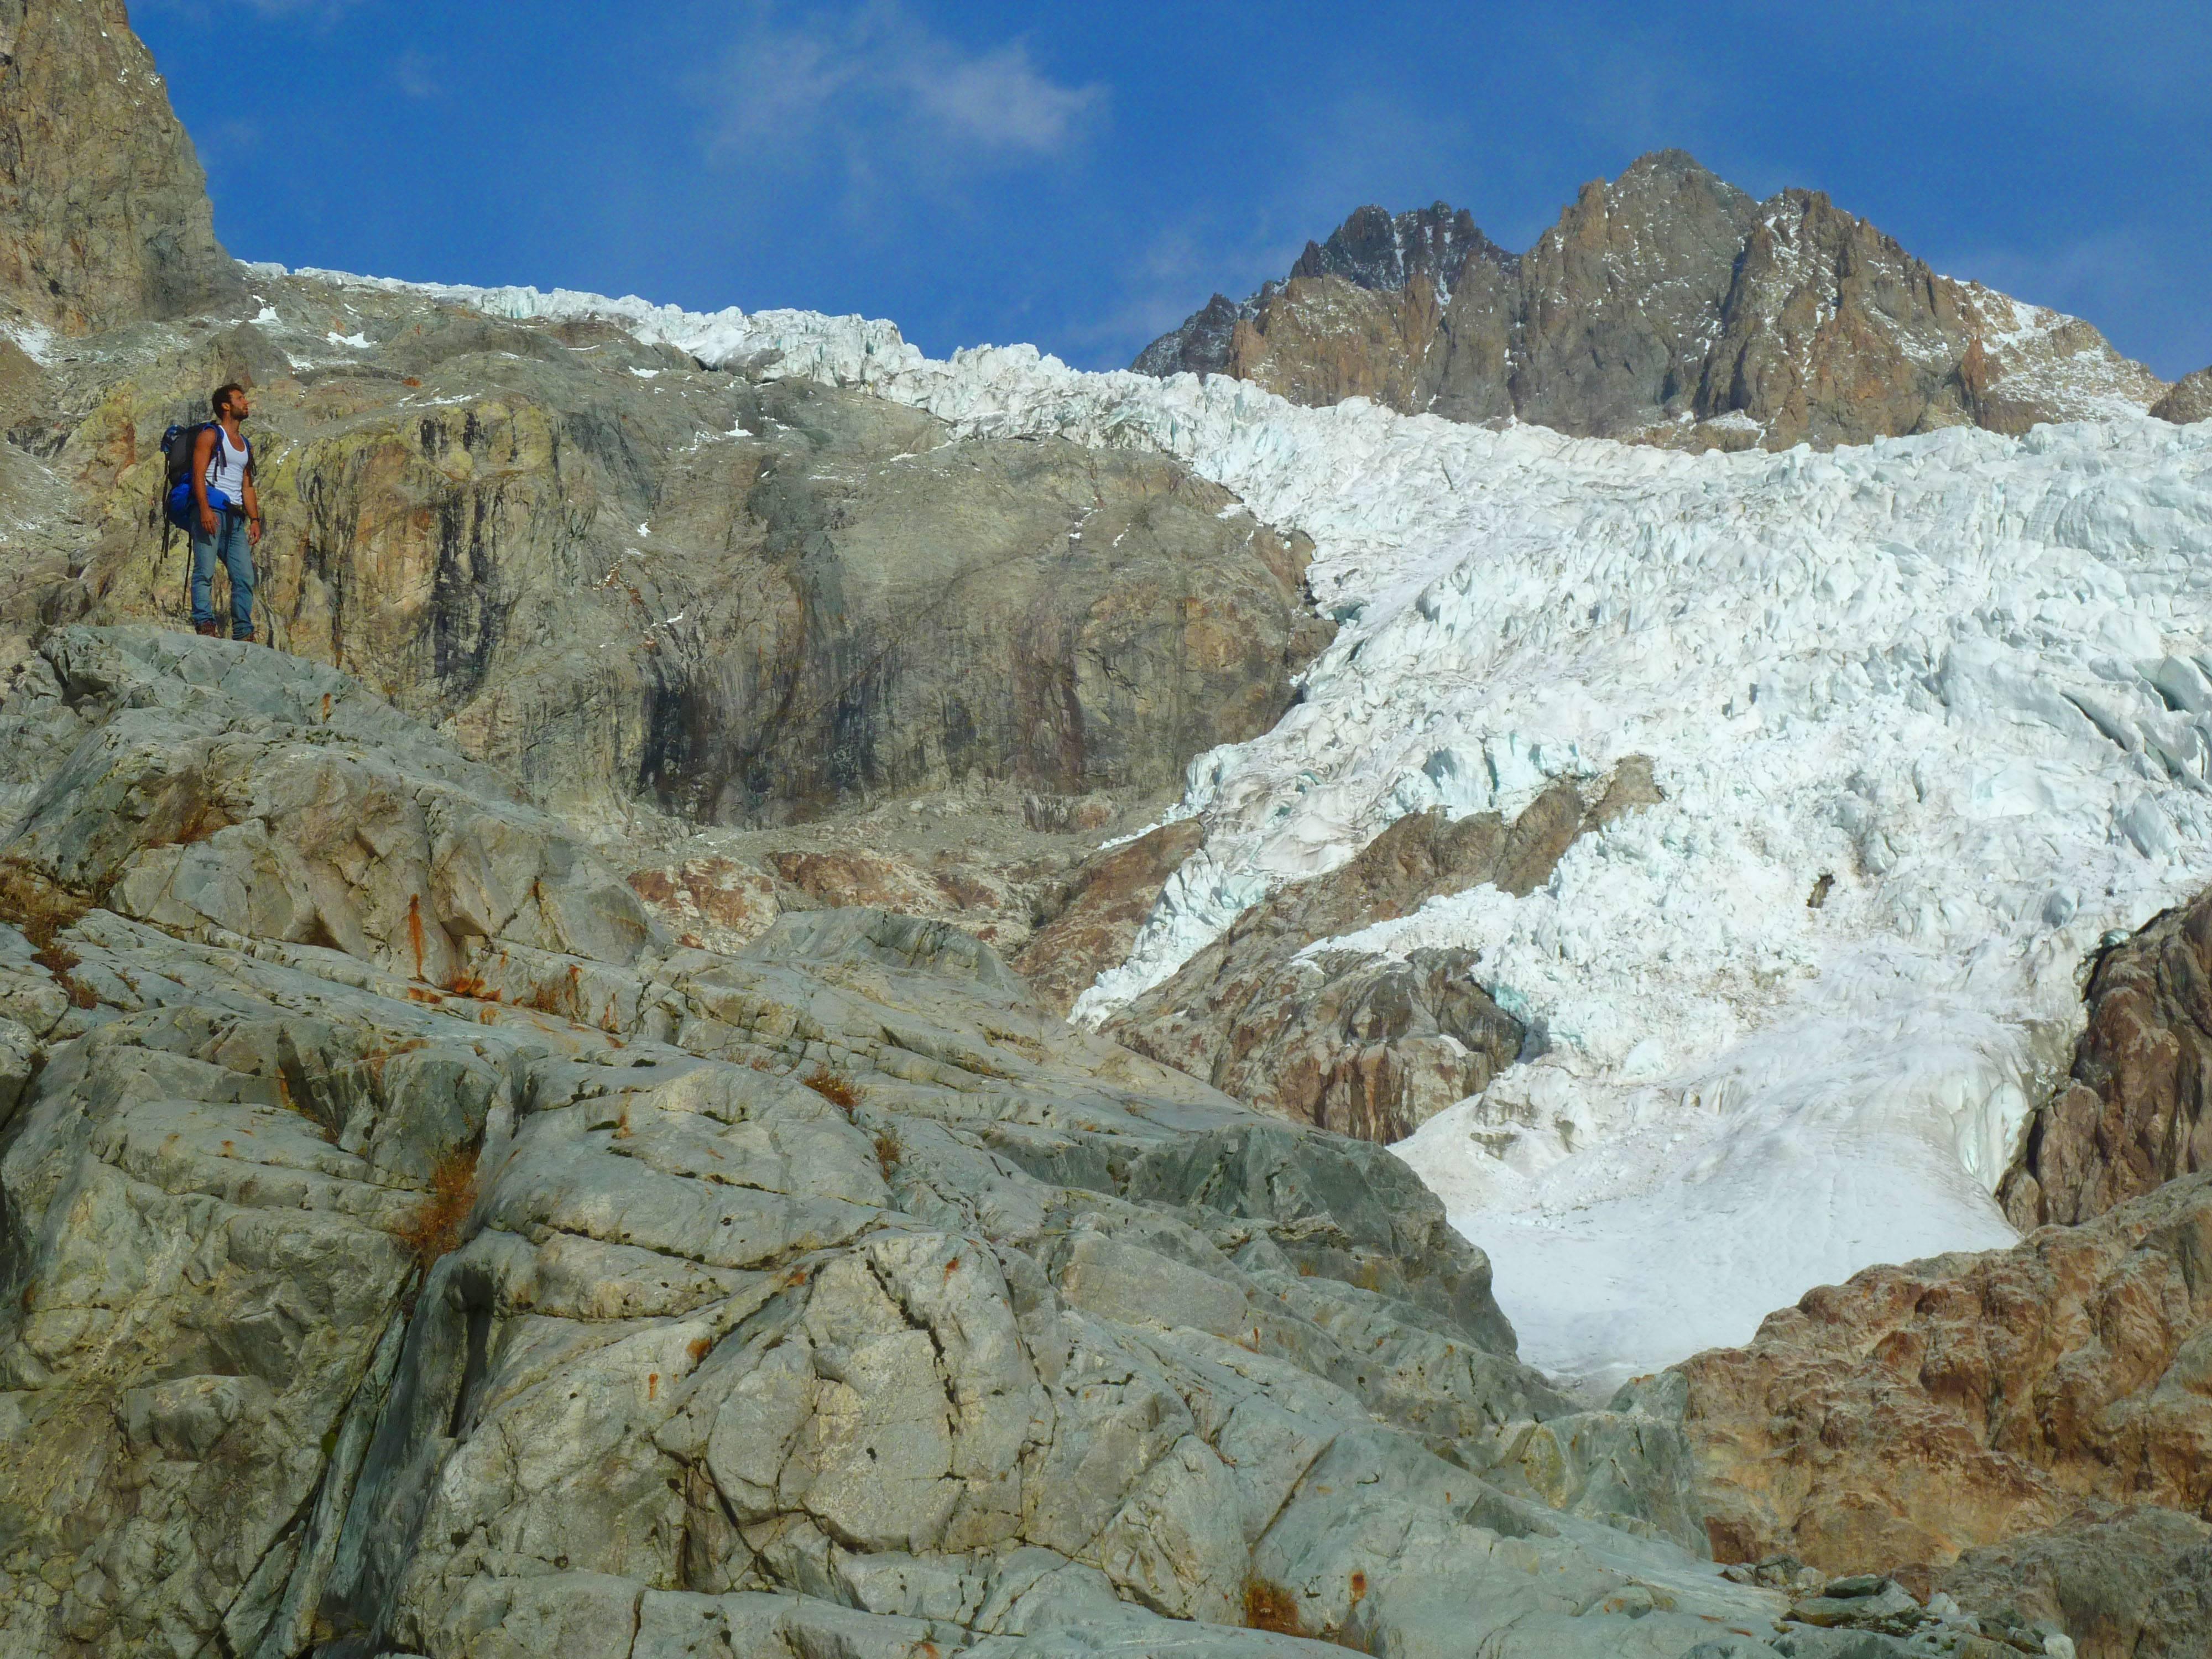 Photo 2: Le refuge du Glacier Blanc